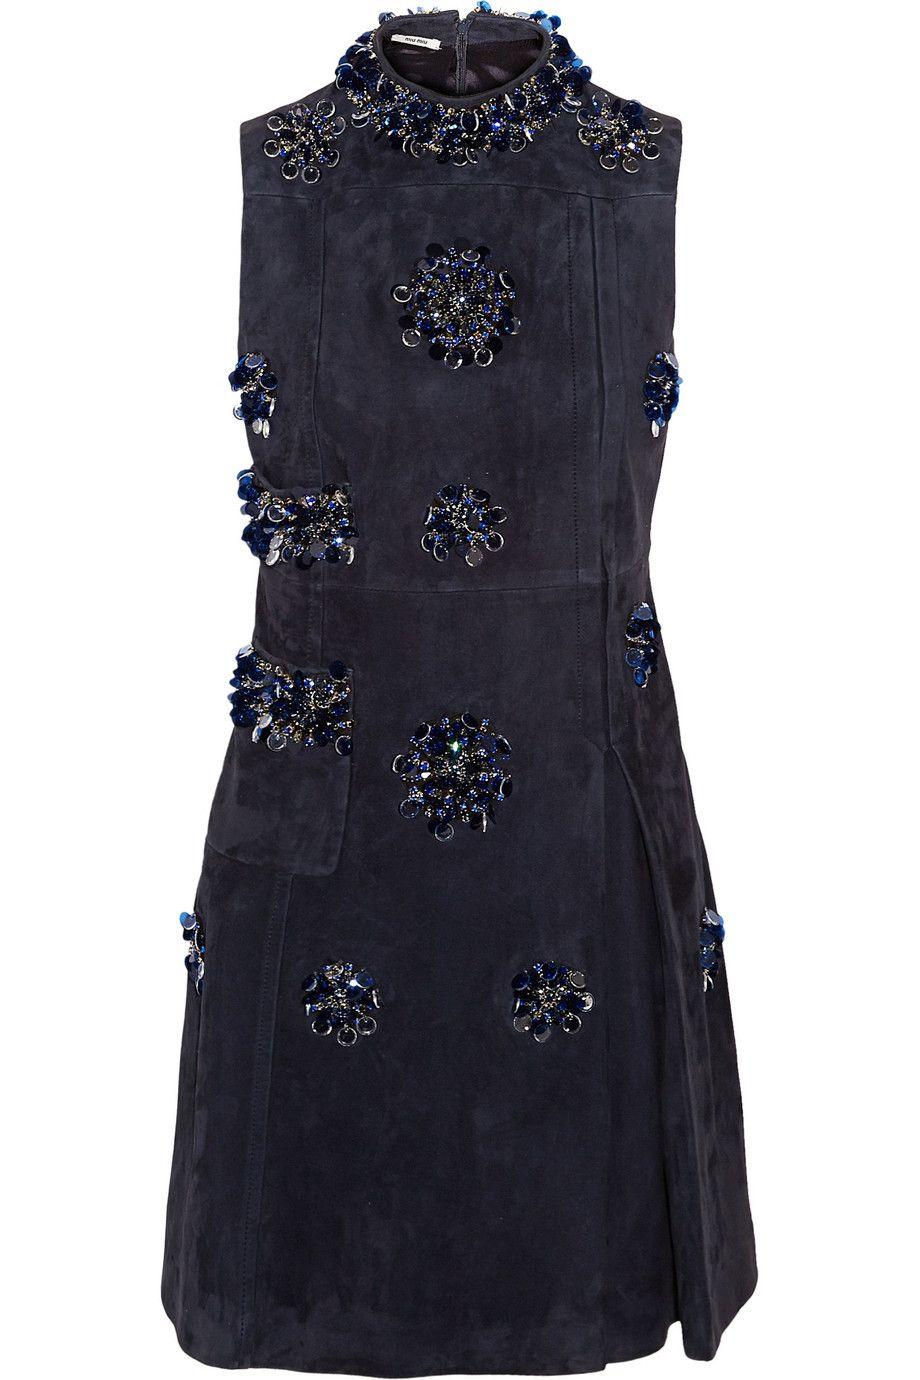 MIU MIU Embellished Suede Mini Dress. #miumiu #cloth #dress